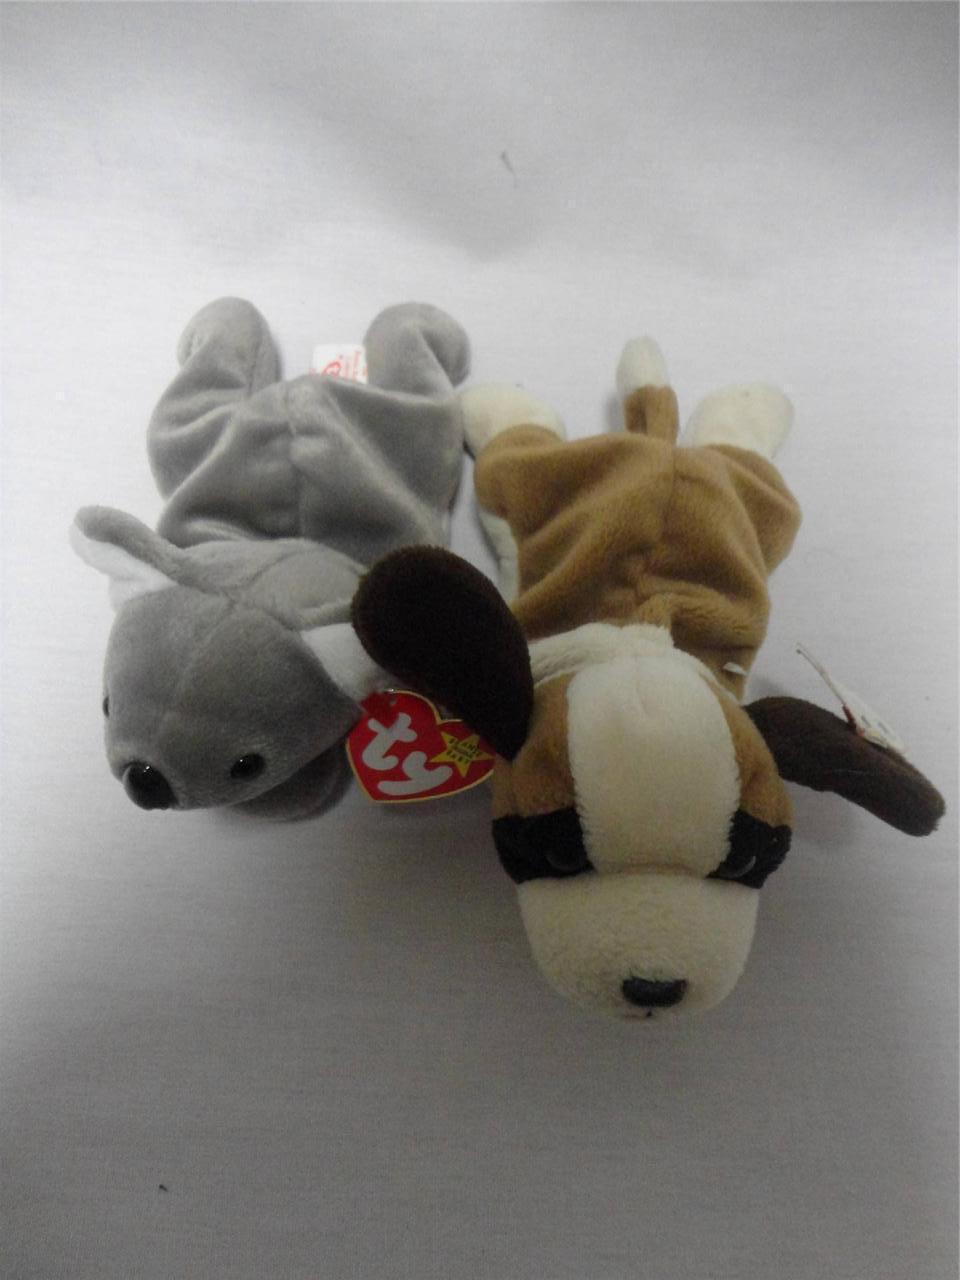 TY Beanie Babies Mel the Koala 1996 and Bernie the Dog 1996 Lot of 2